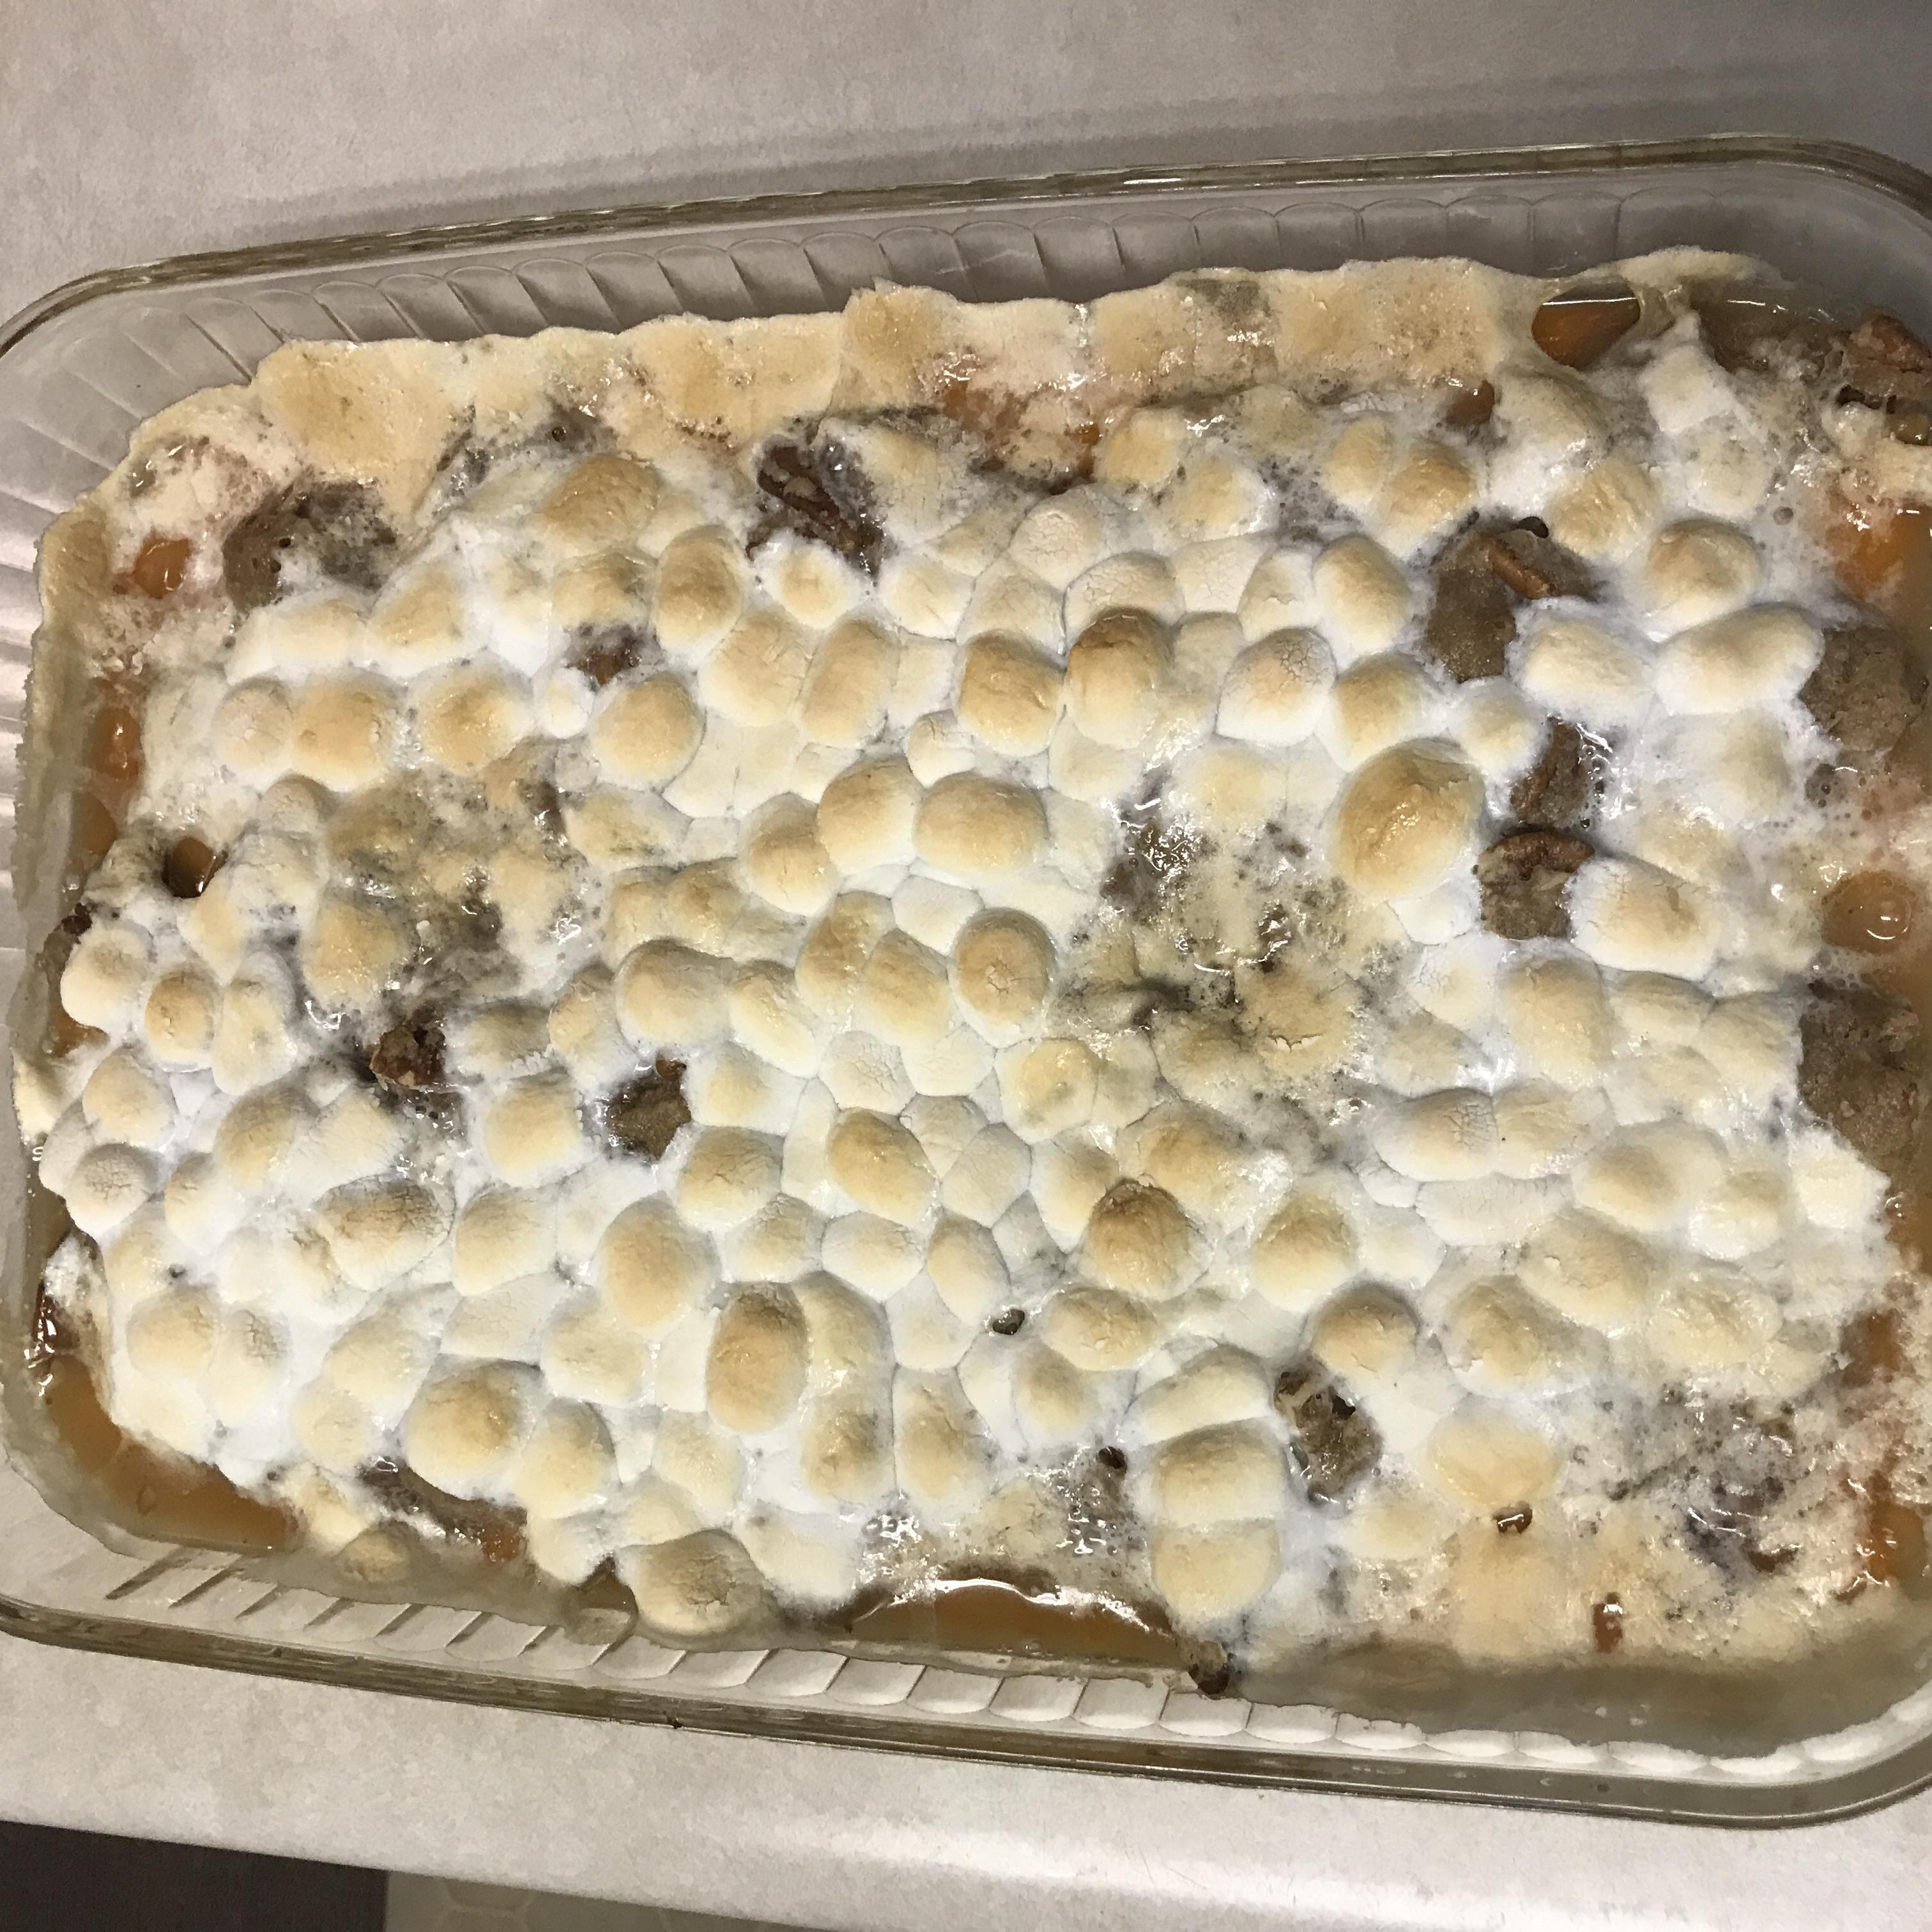 Susan's Sweet Potato Casserole